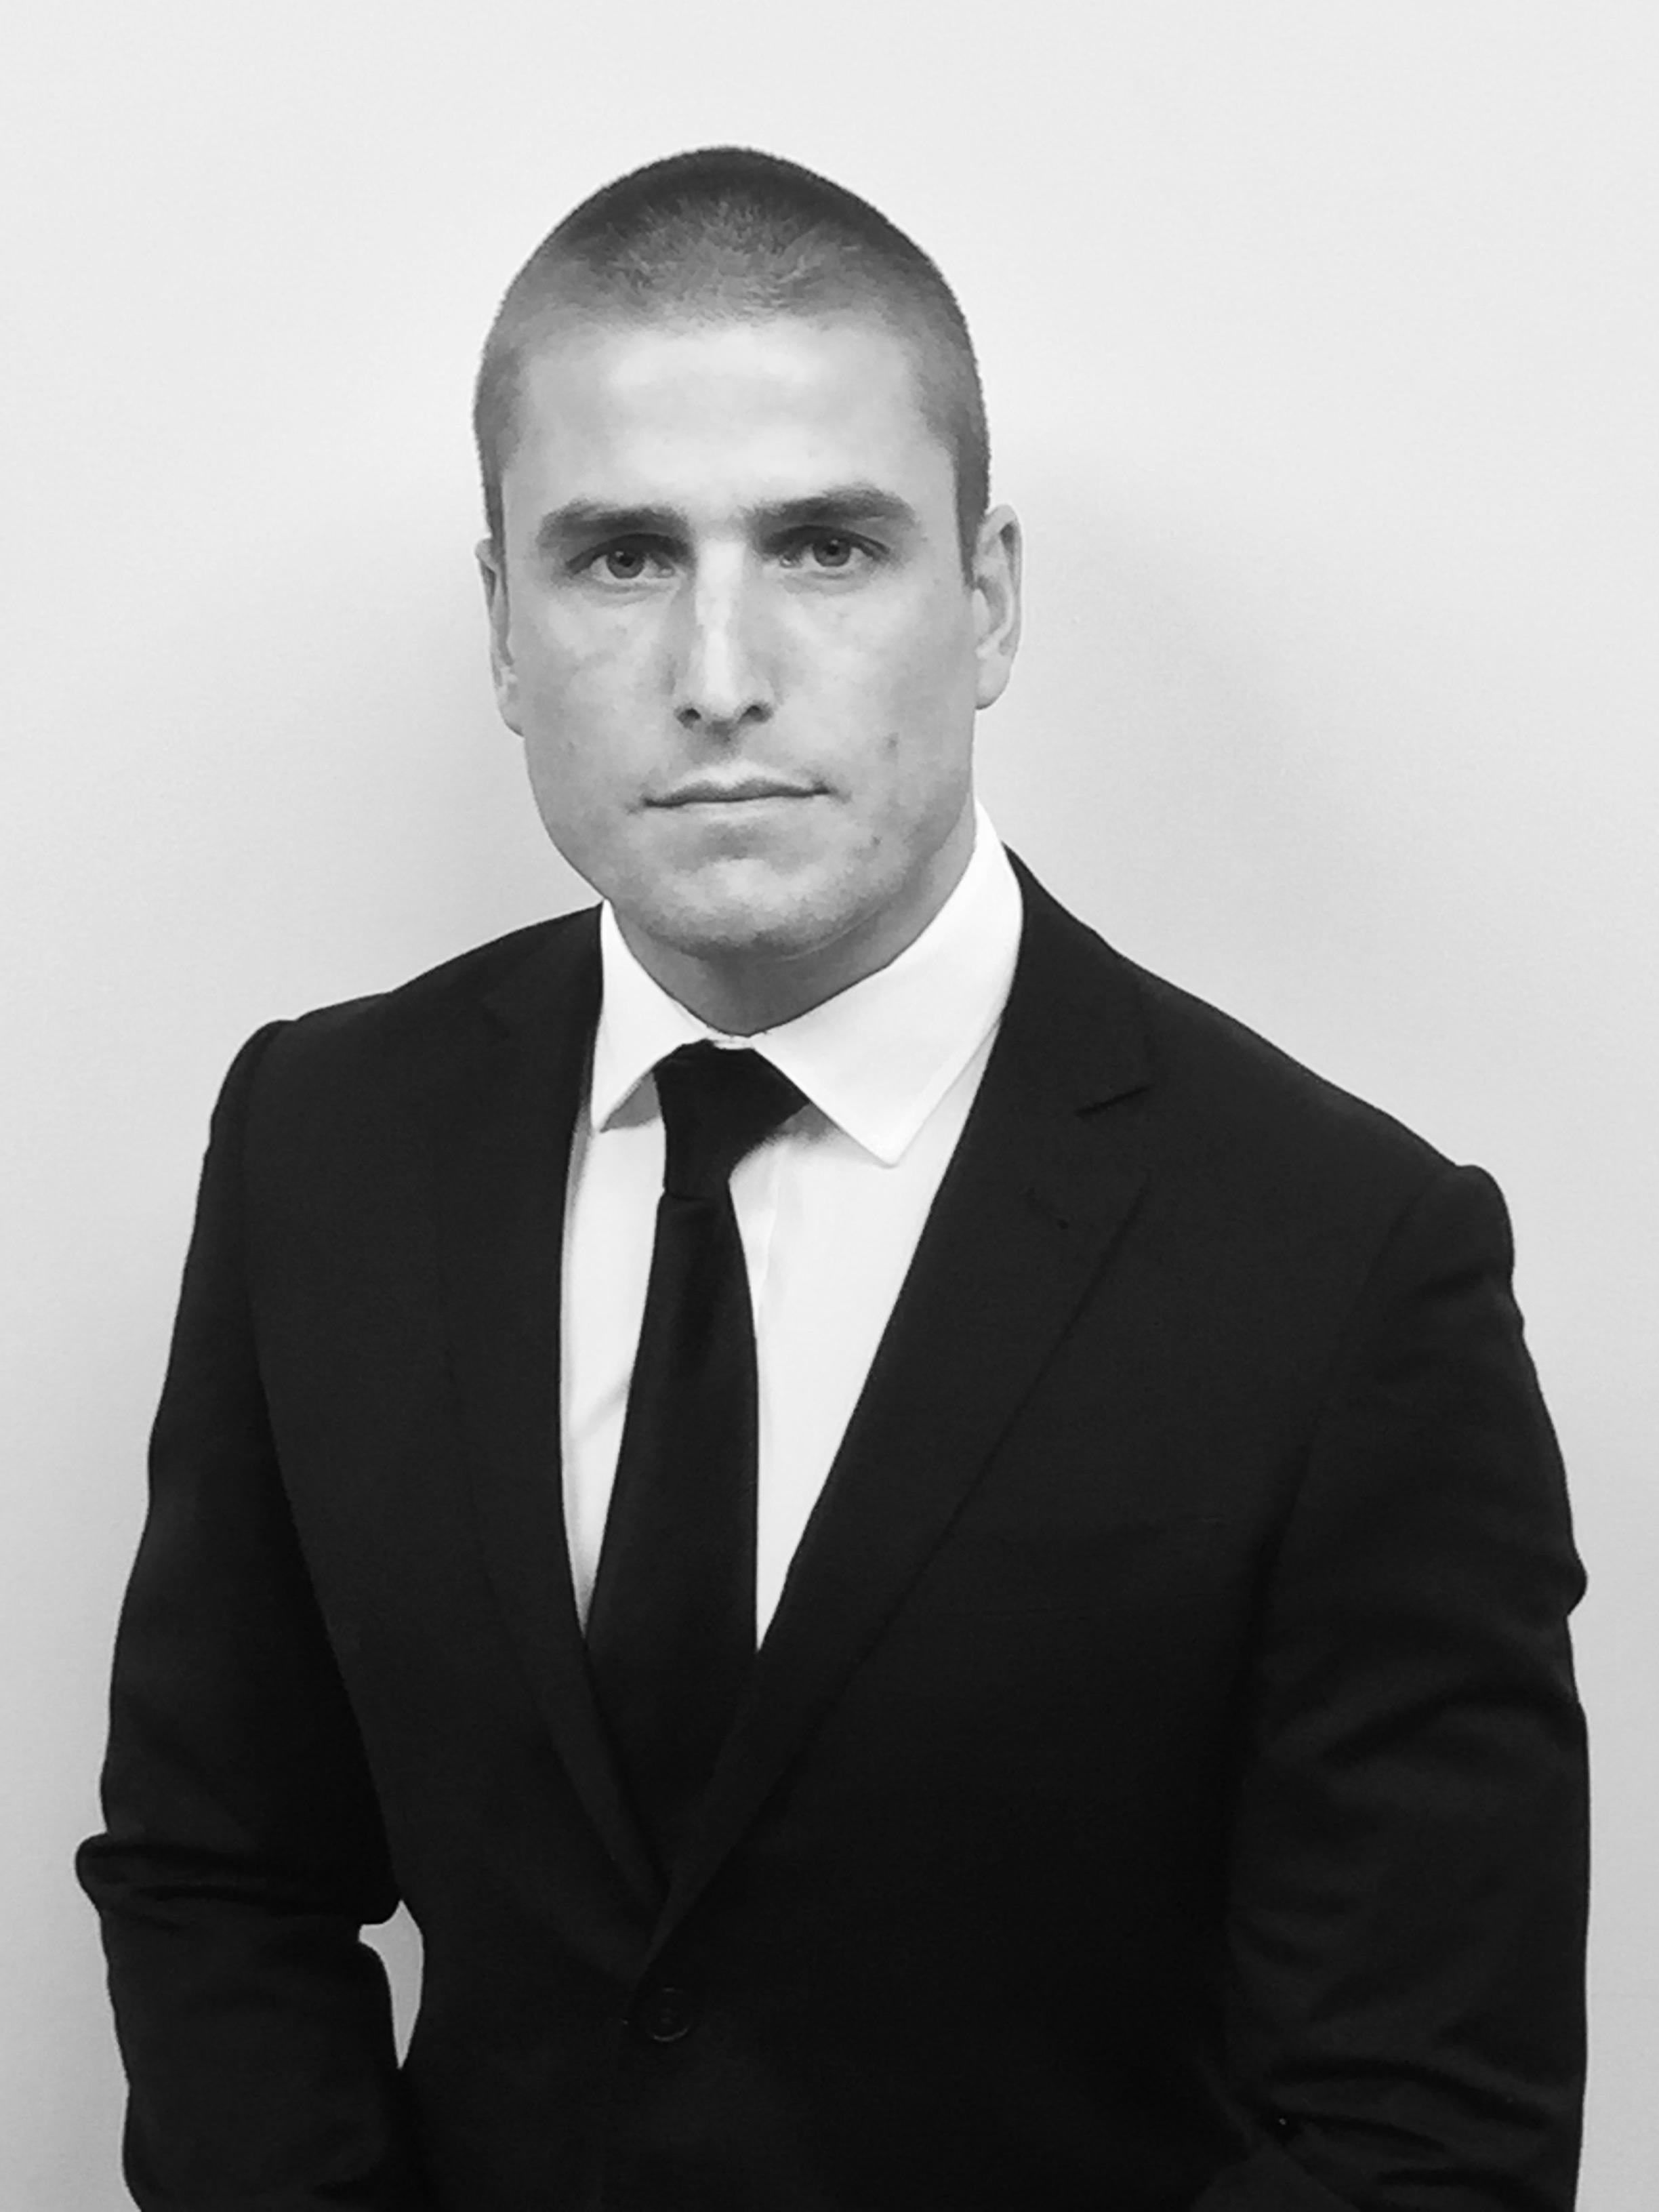 Jack Heeley, BPD (Property & Construction), LLB (Hons)